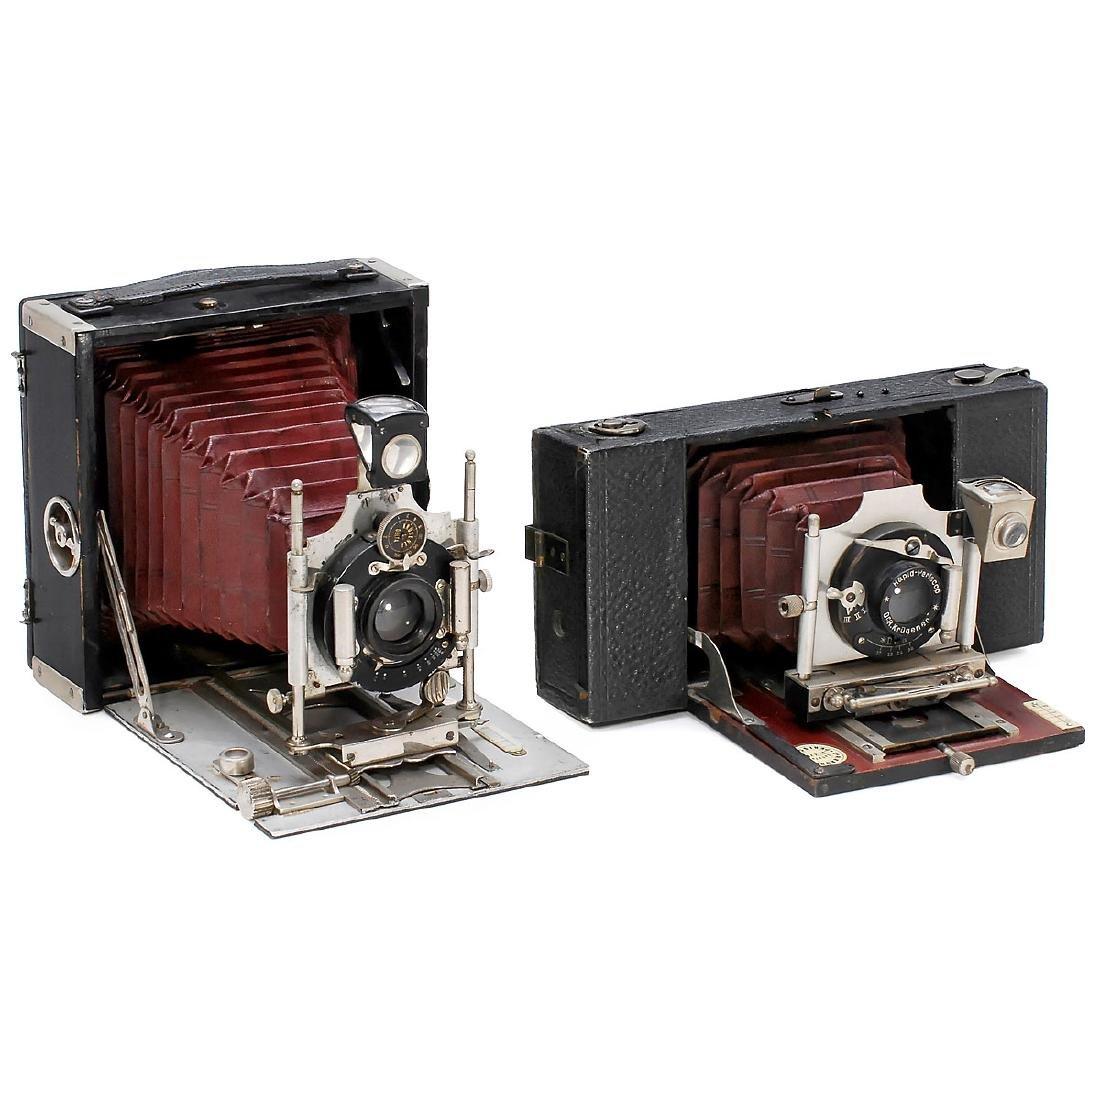 2 Krügener Cameras